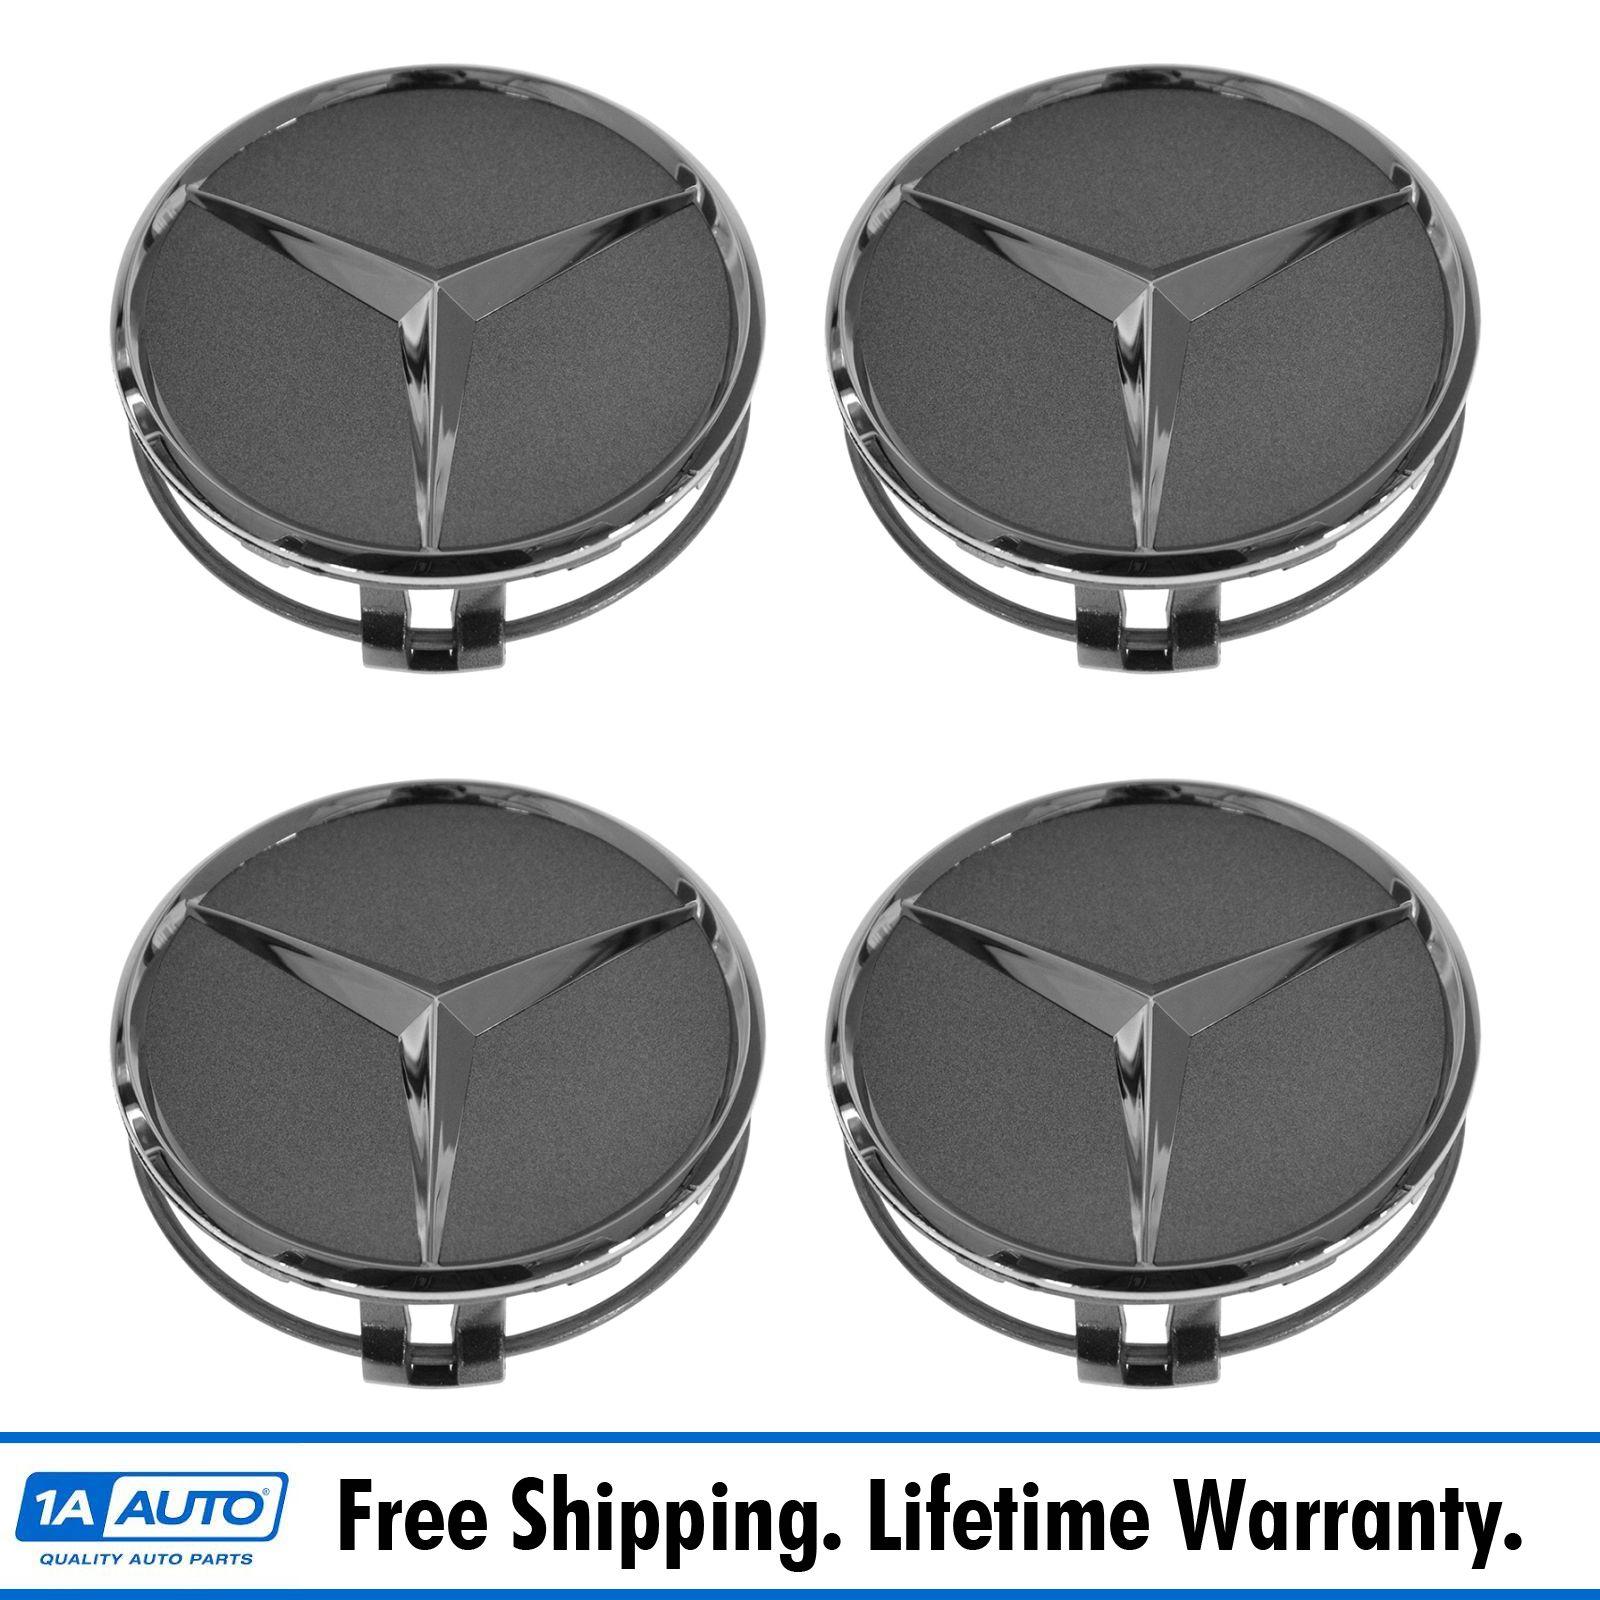 no Piston Ring For PWC YAMAHA 760//1200 Piston Kit 64X-11631-00 oversize 1.00